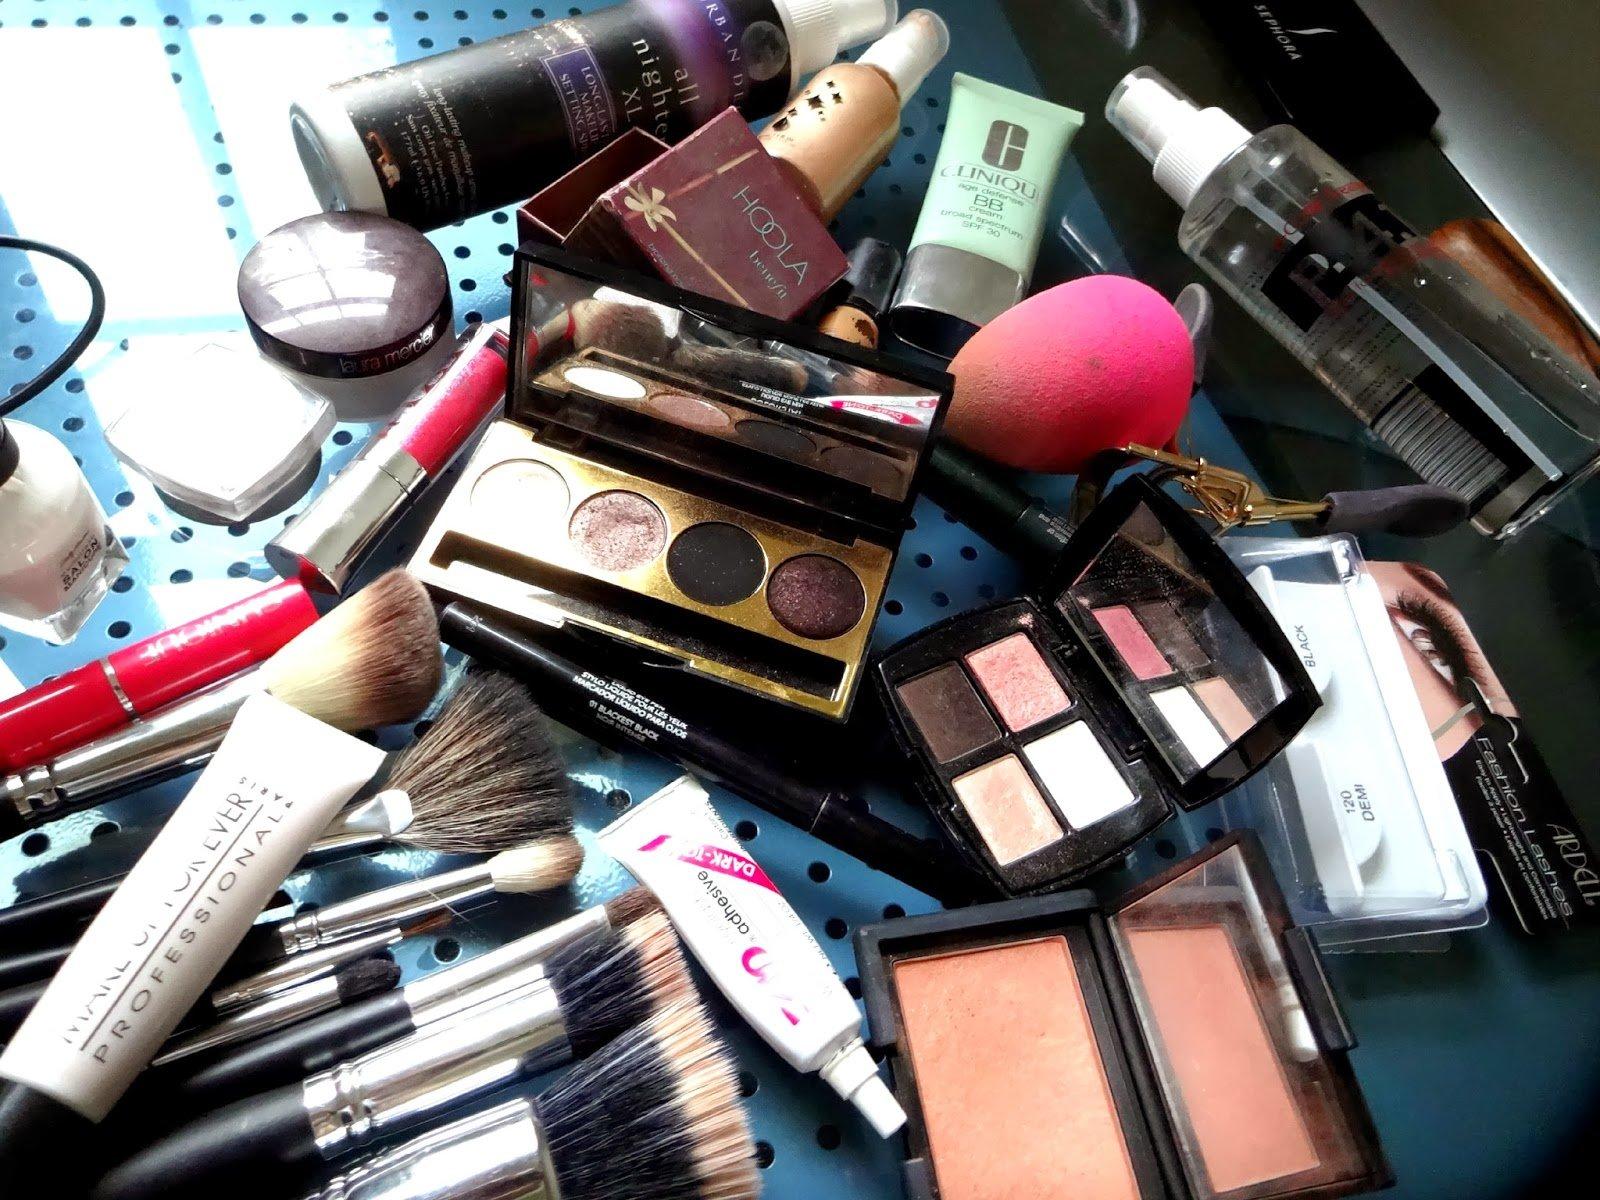 Care este durata de viata a produselor de makeup?